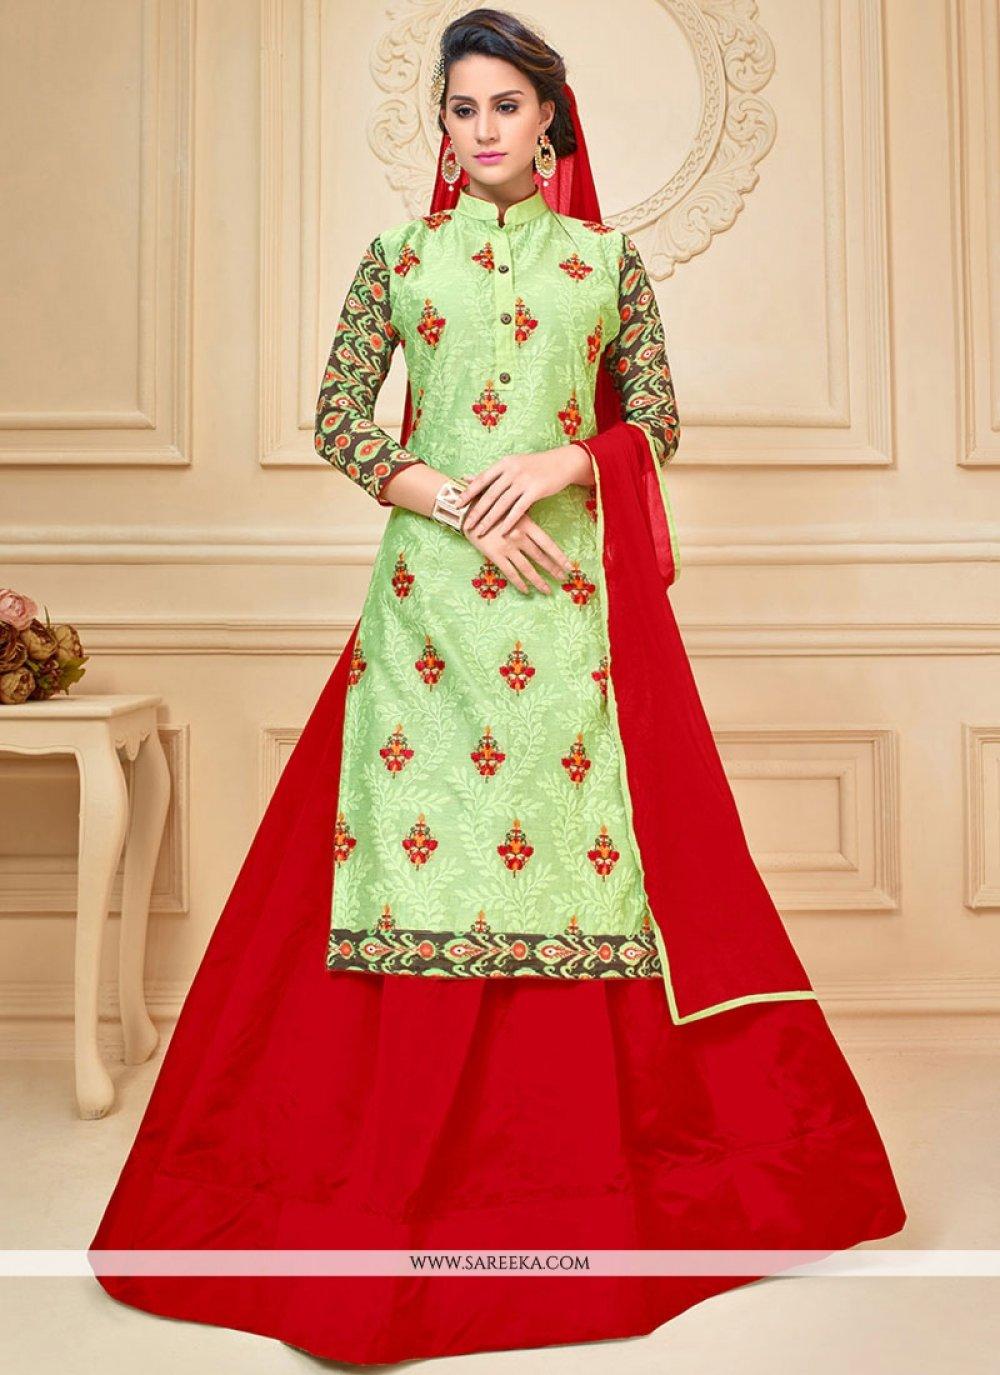 Green and Red Embroidered Work Chanderi Cotton Long Choli Lehenga